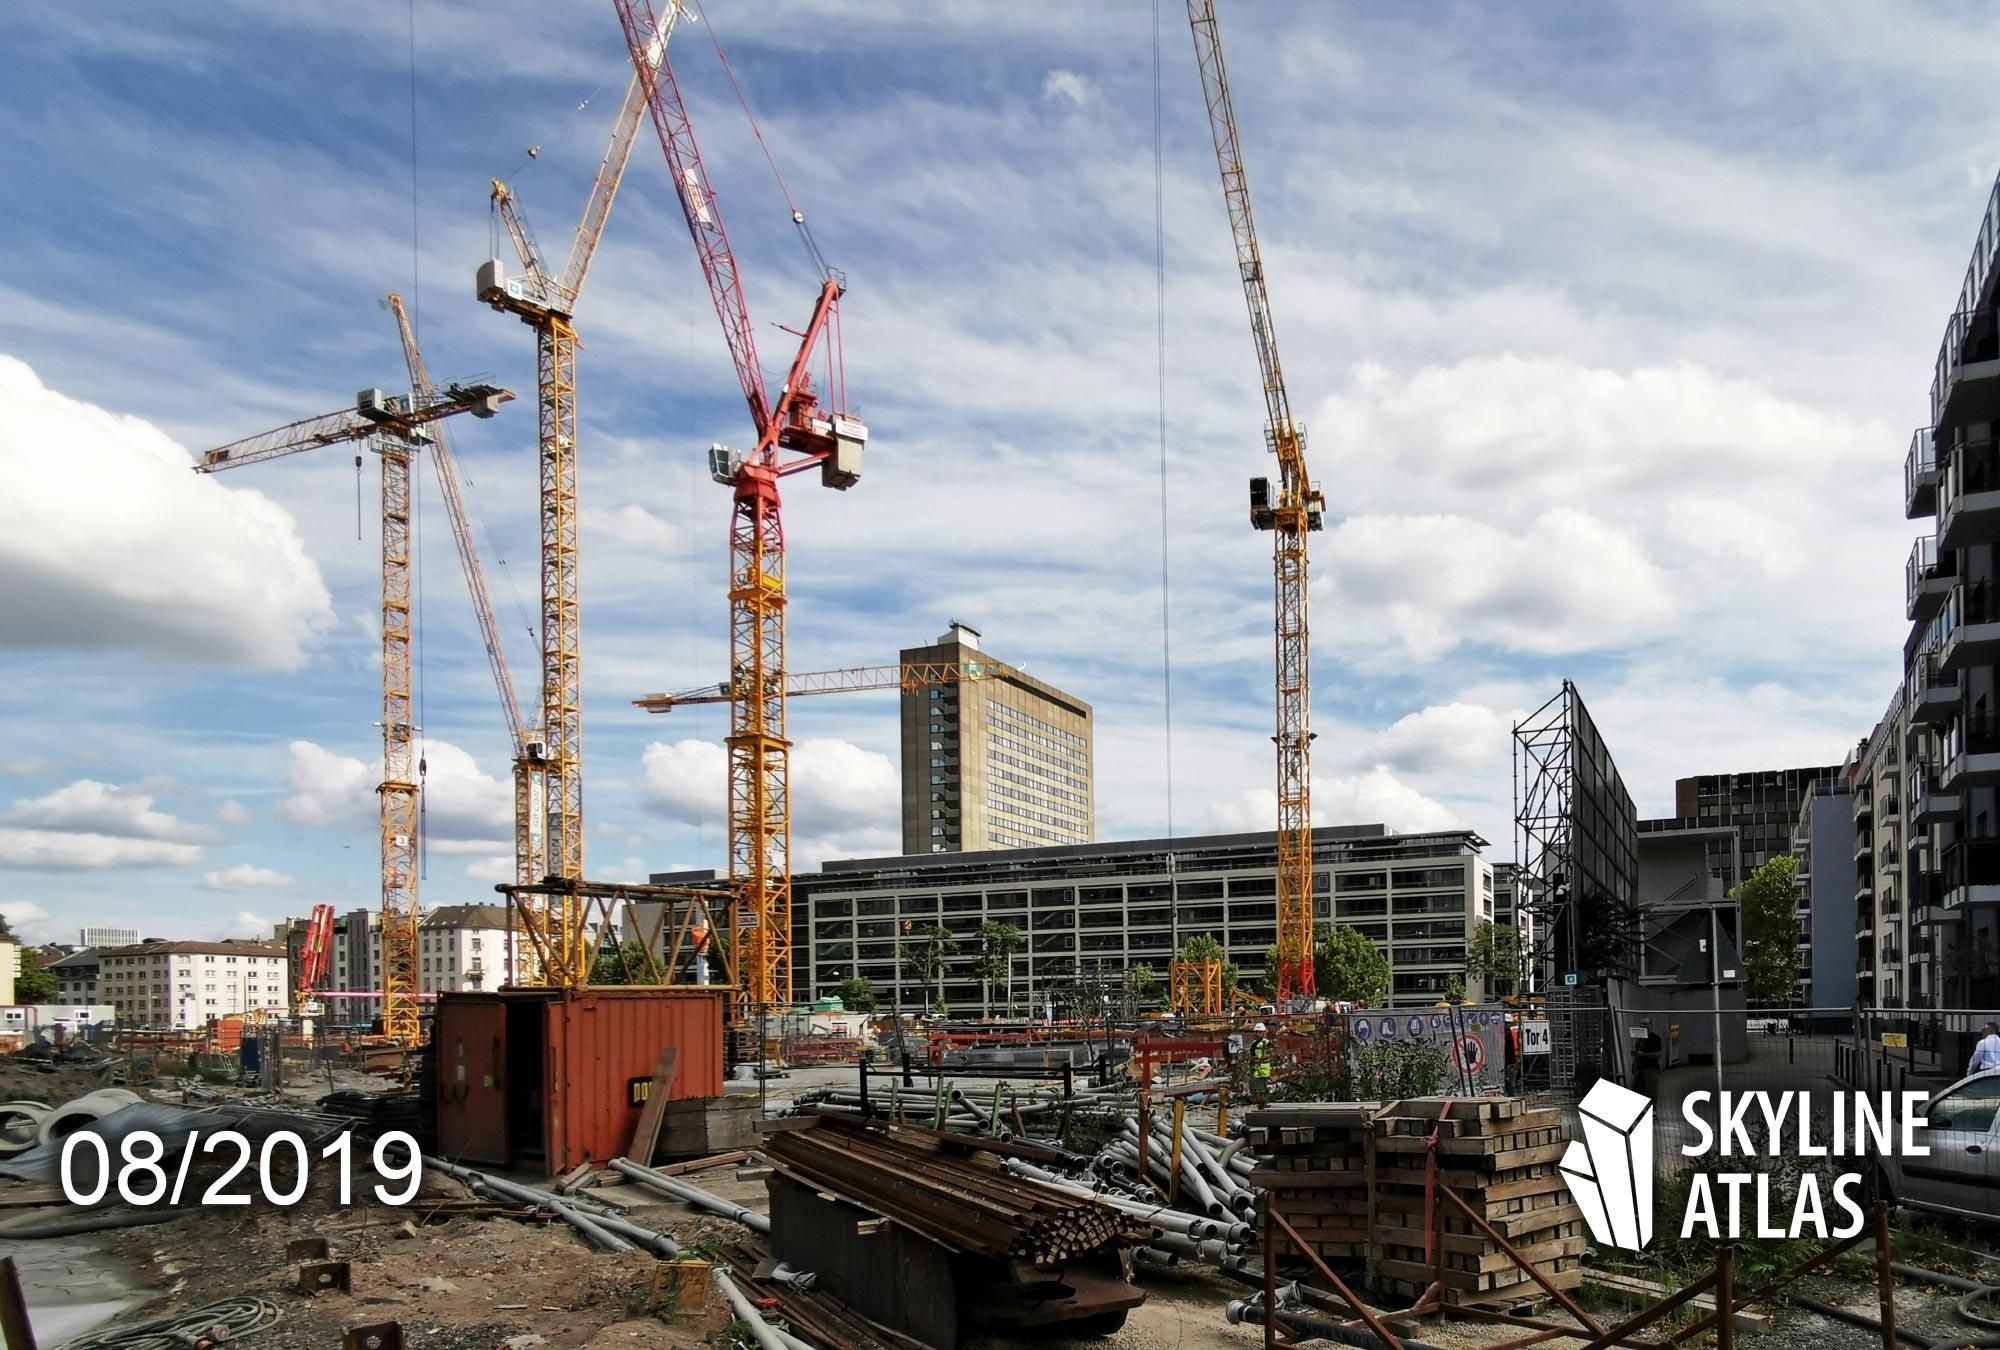 EDEN Frankfurt - Buy apartment - Condo tower - Condominiums for sale - construction site as of August 2019